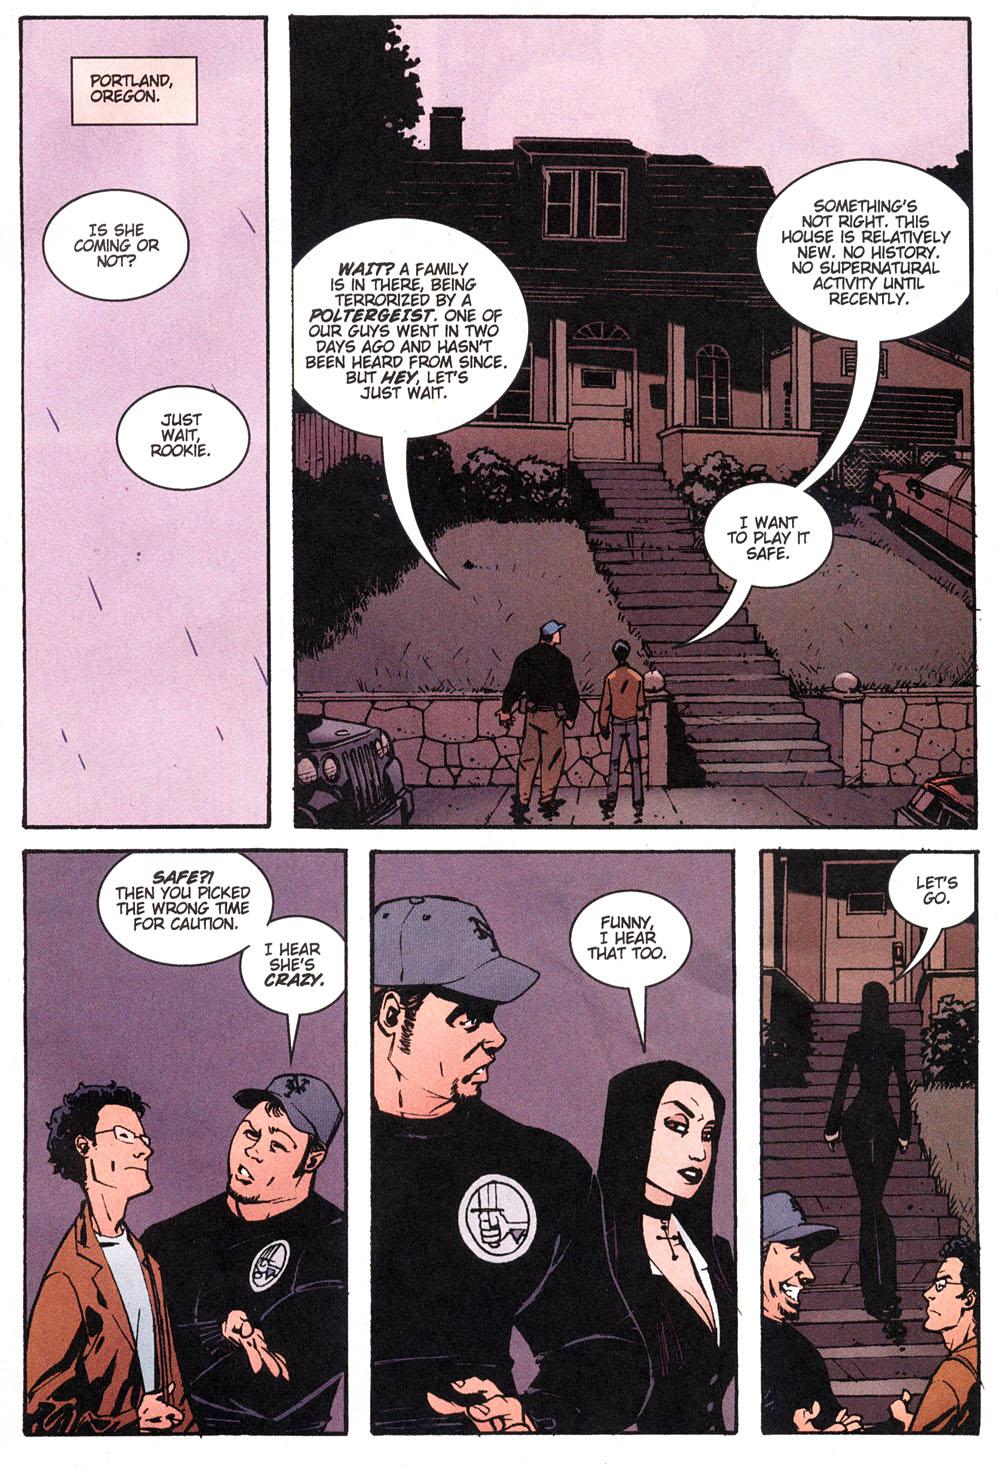 Read online Hellboy: Weird Tales comic -  Issue #4 - 5